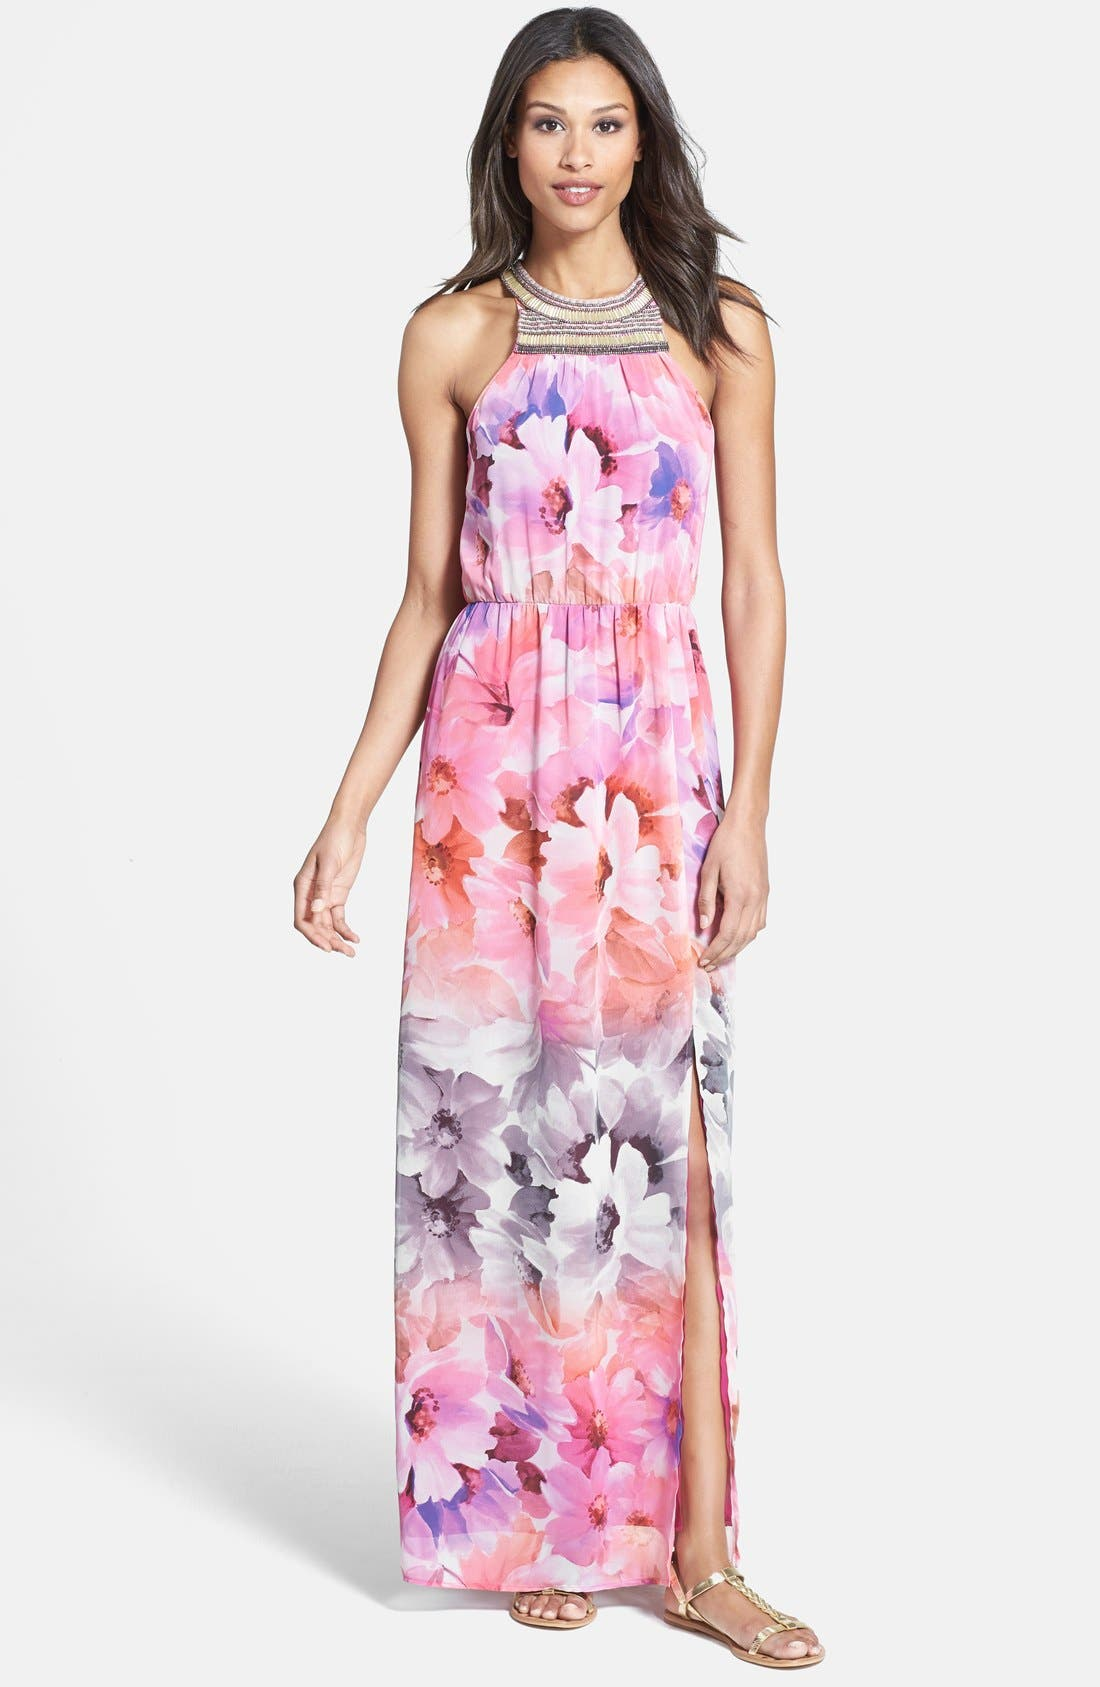 Alternate Image 1 Selected - Charlie Jade 'Ava' Print Maxi Dress